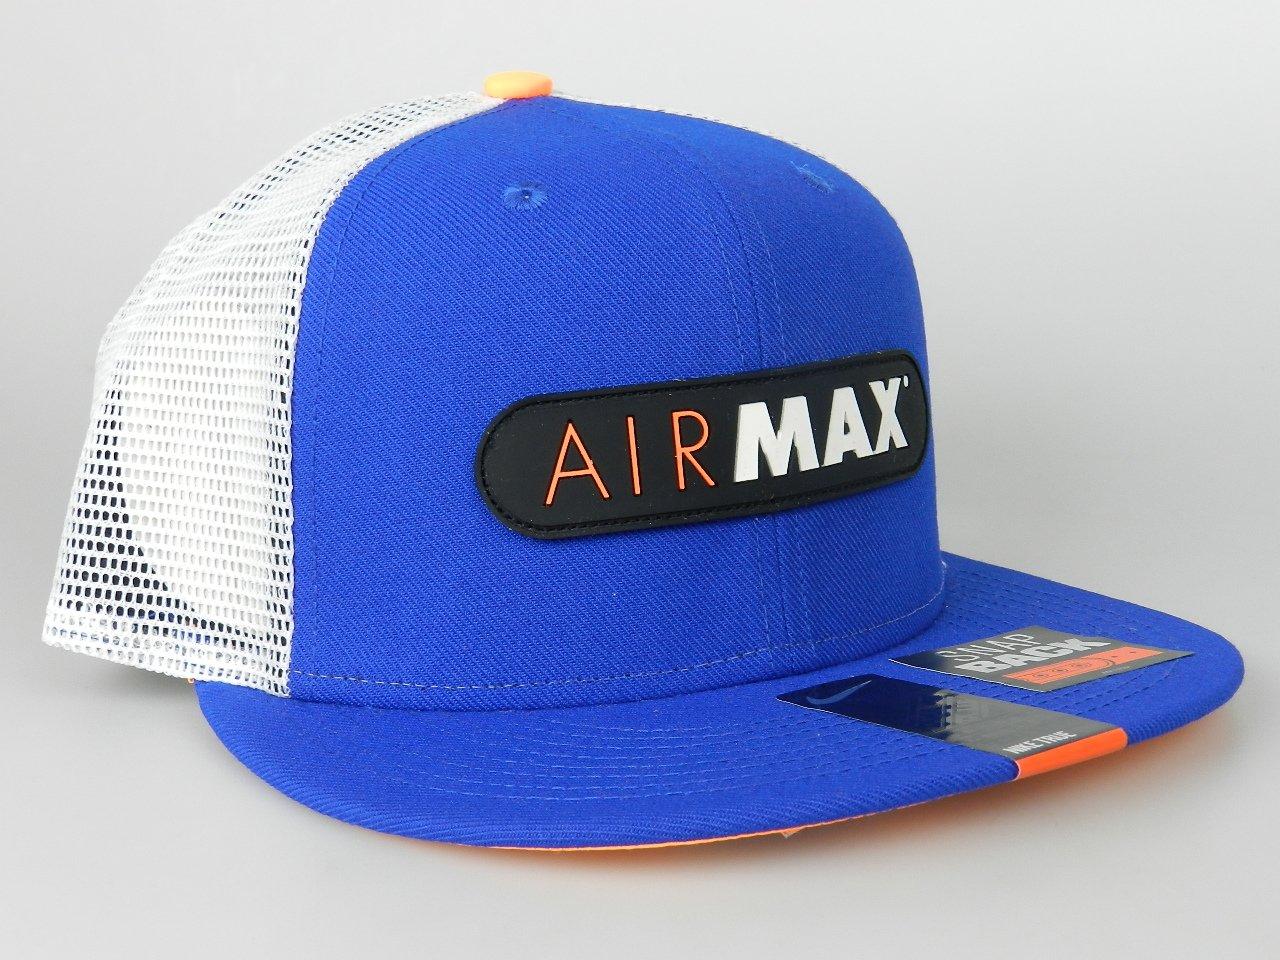 check out 47ae4 3abab Amazon   Nike Air Max 93 QT S +メンズブルーオレンジTruckerメッシュ帽子657993 489   NIKE    帽子・キャップ